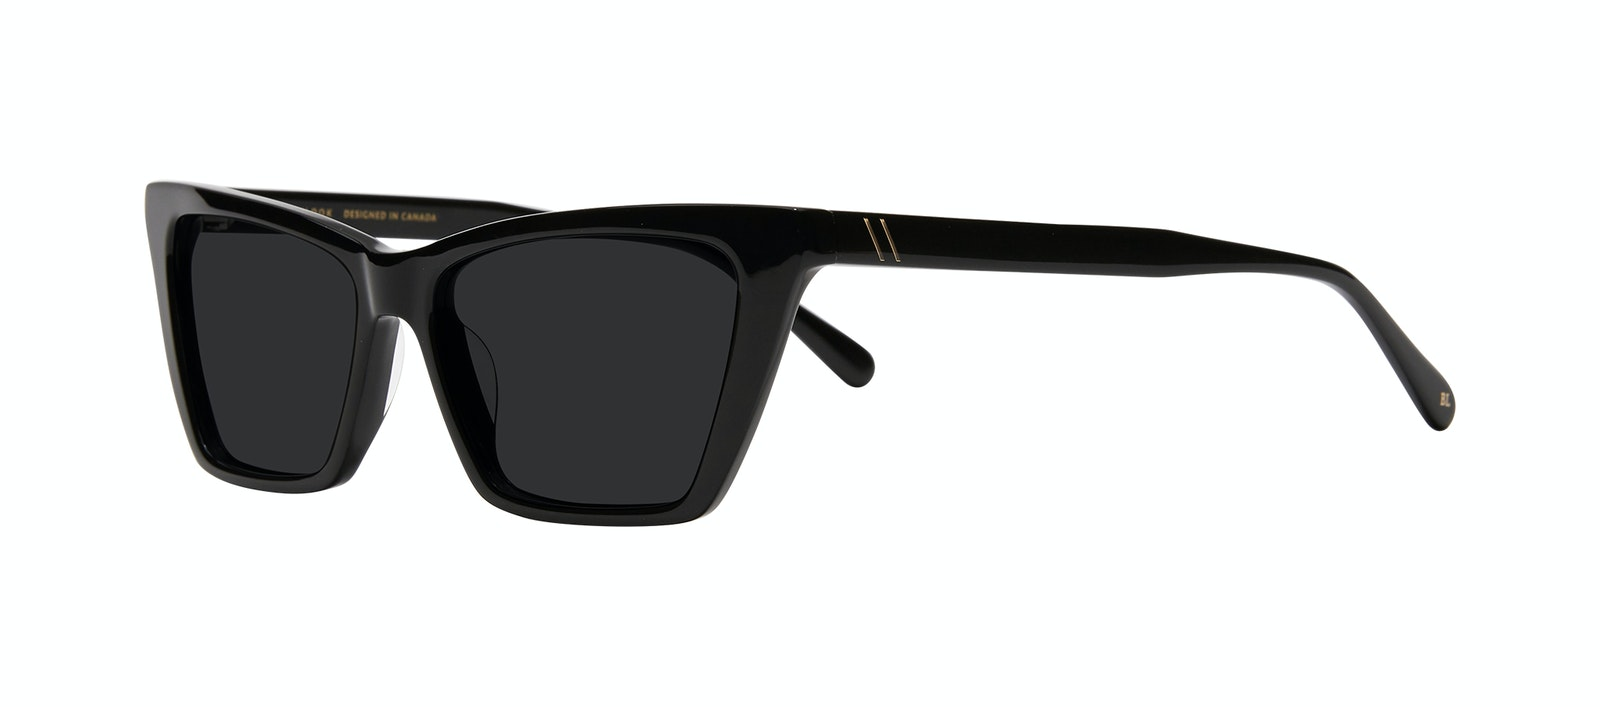 Affordable Fashion Glasses Cat Eye Sunglasses Women Indio Black Tilt